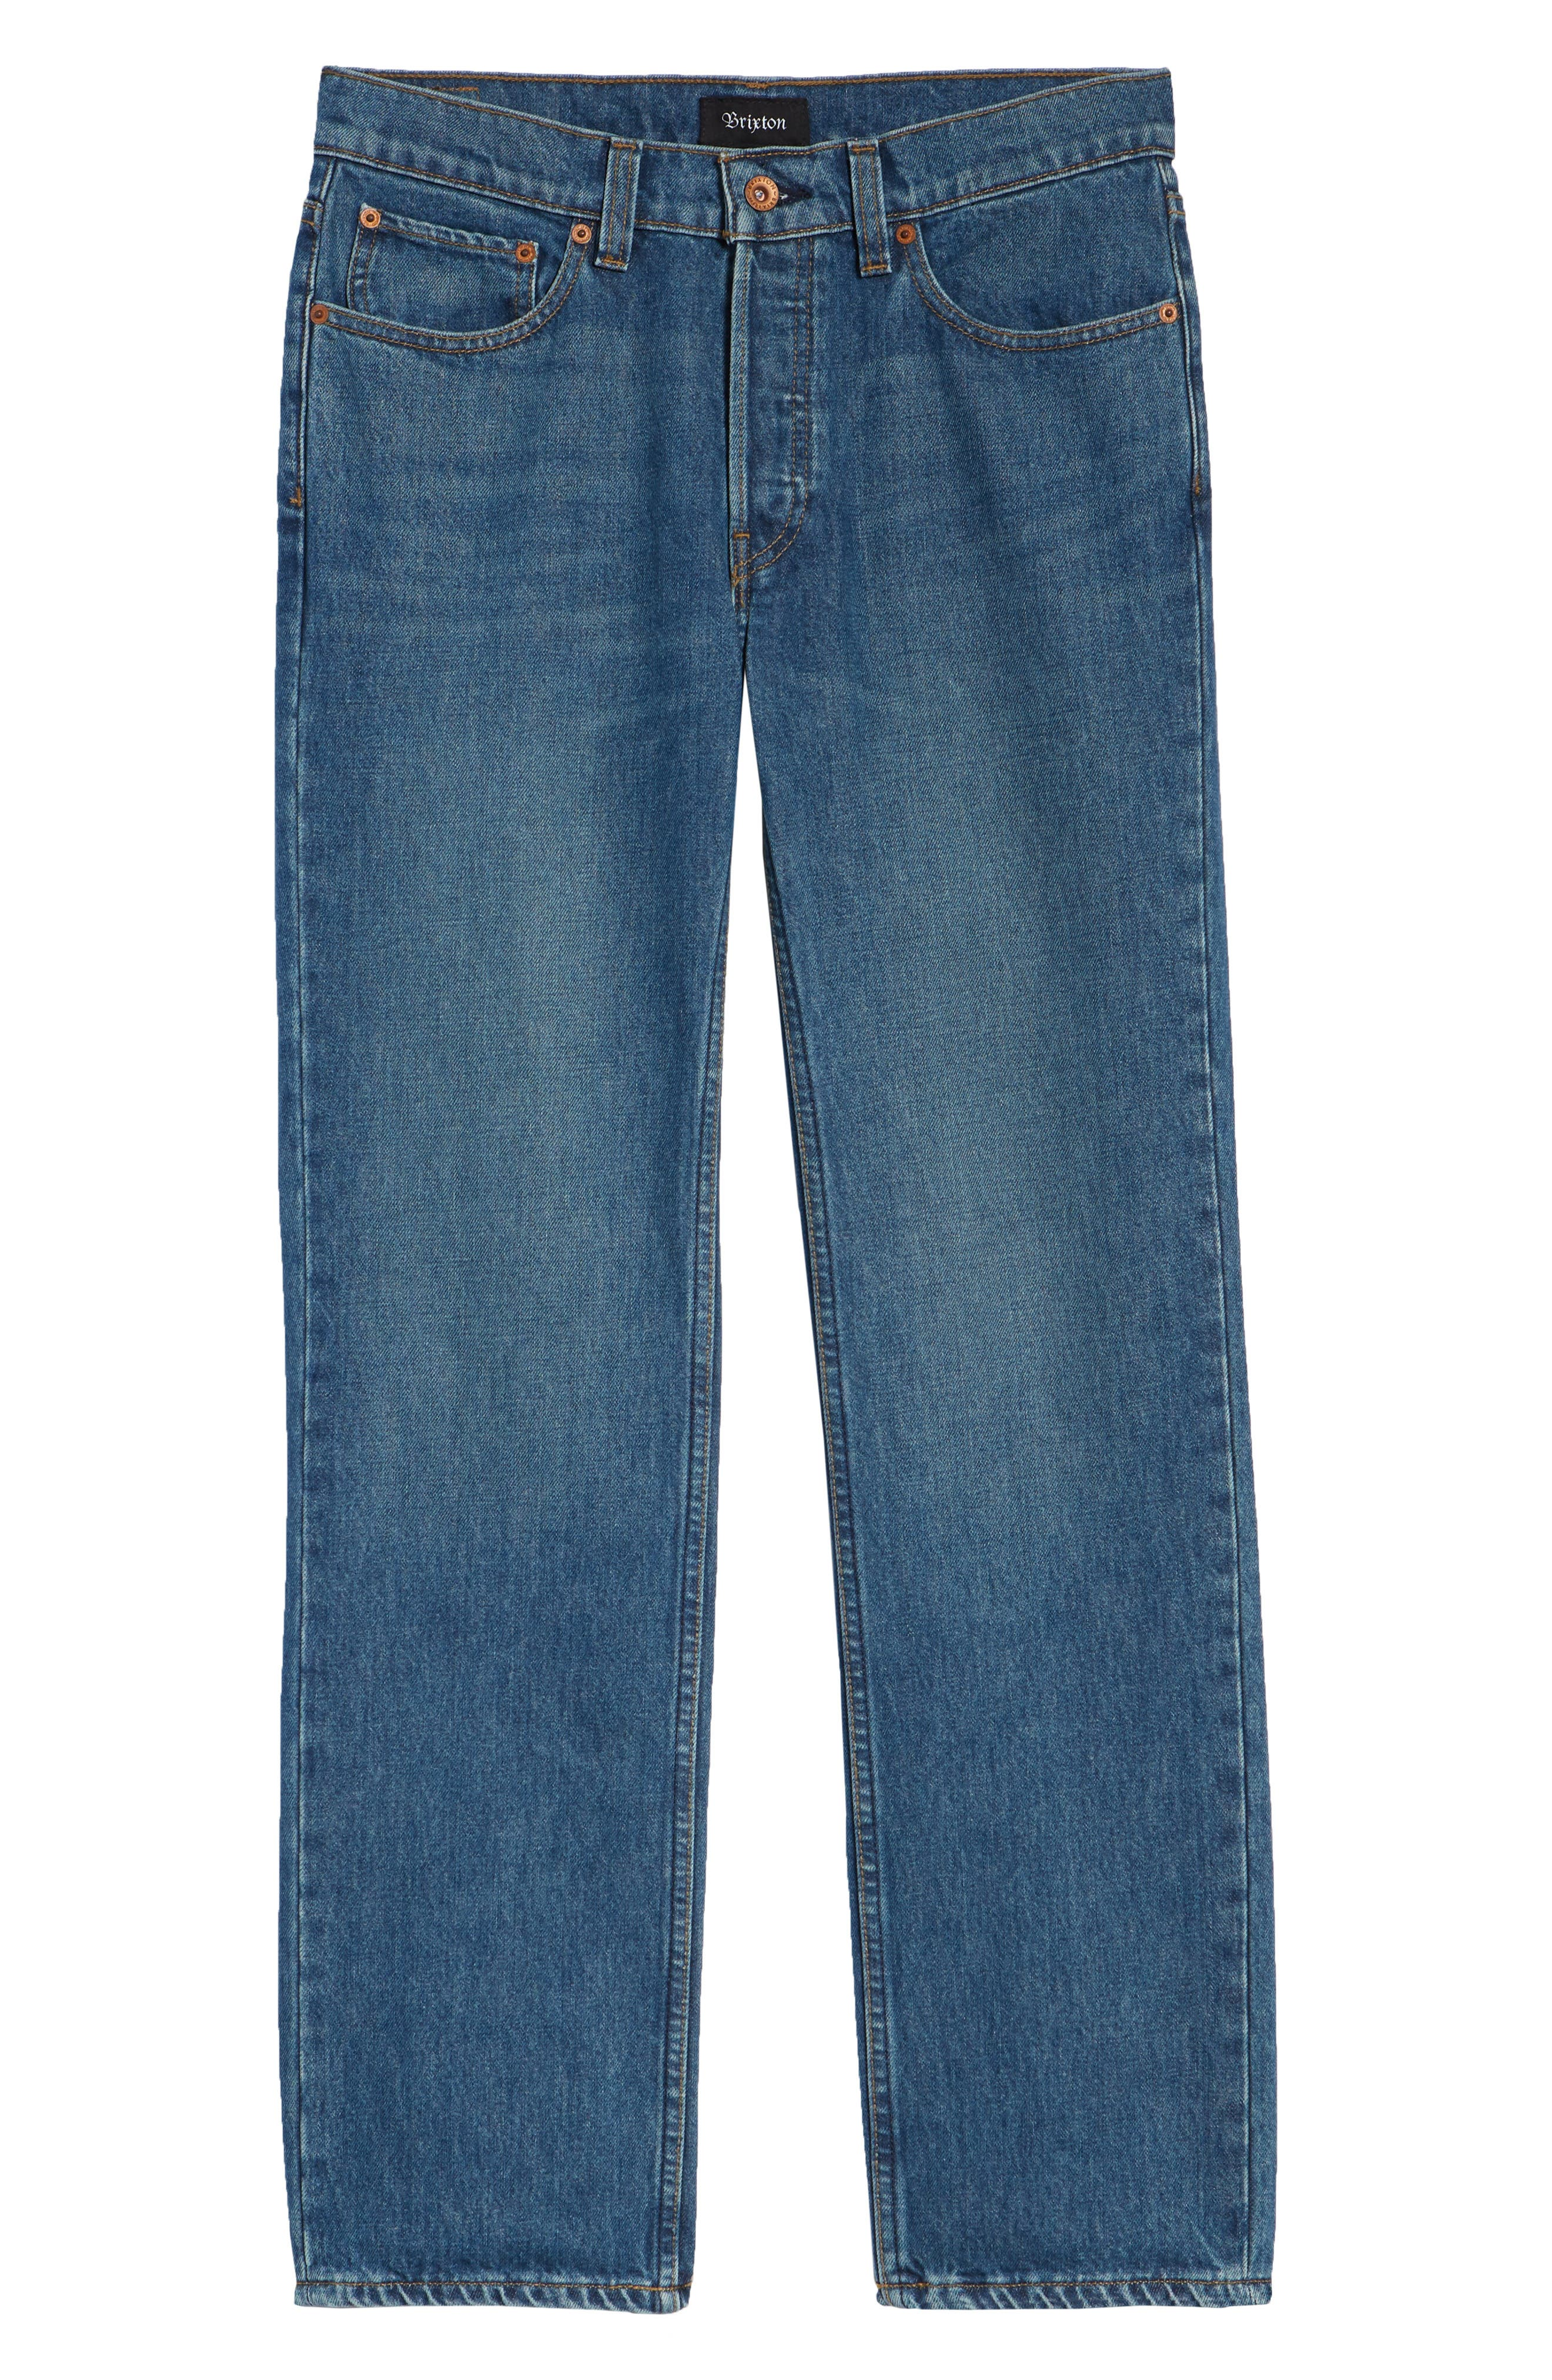 Labor Straight Leg Jeans,                             Alternate thumbnail 6, color,                             400